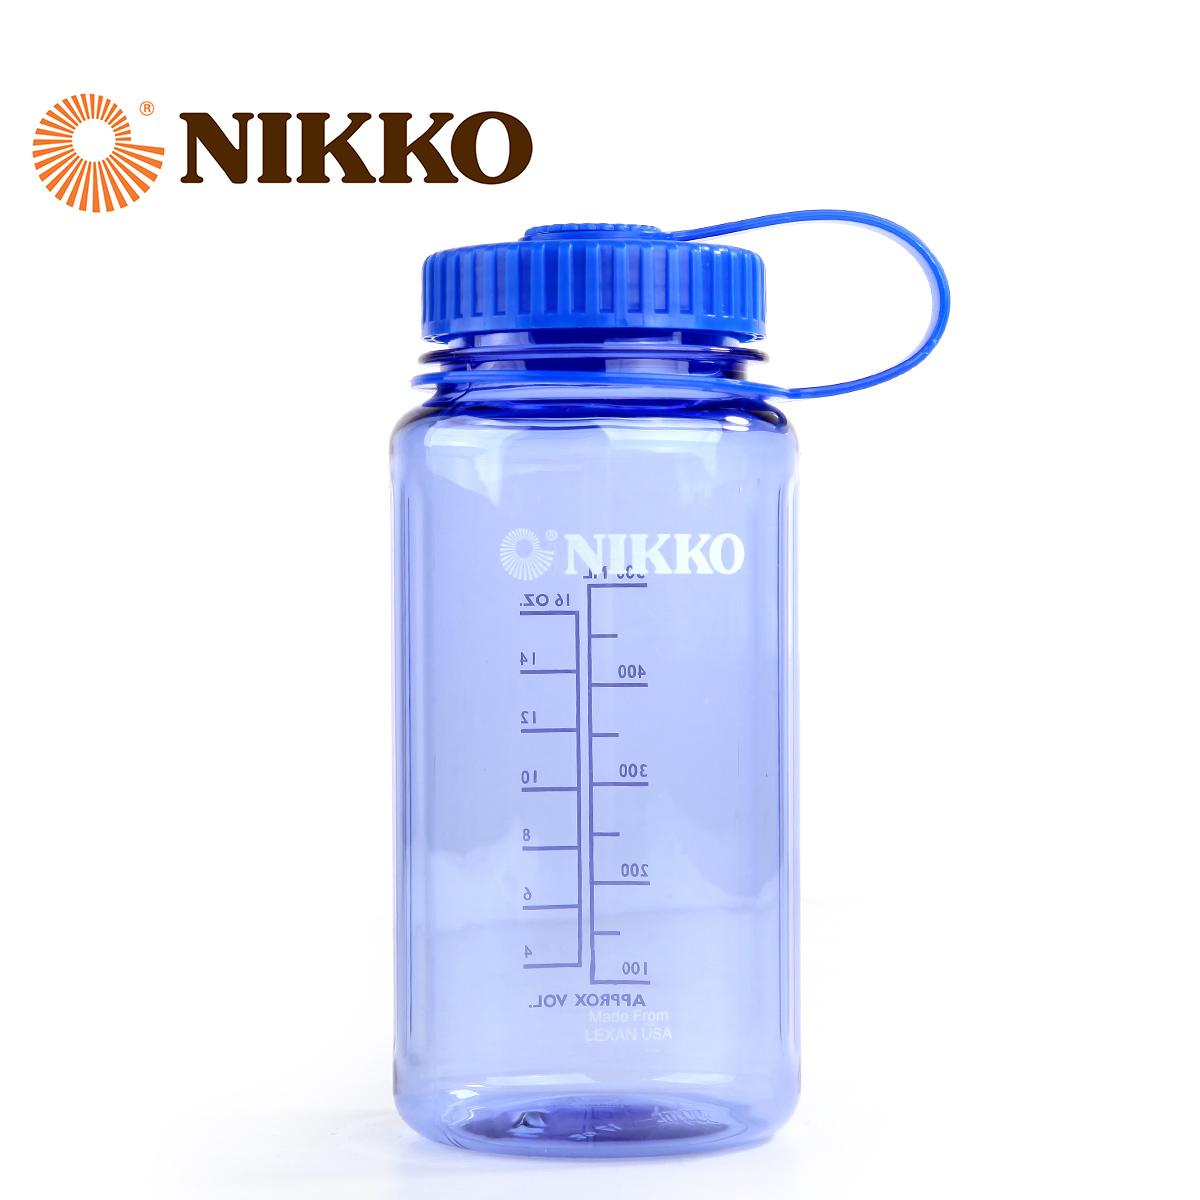 Nikko日高 500ml阔口水壶户外水瓶大容量抗摔耐高温便携NCW2500